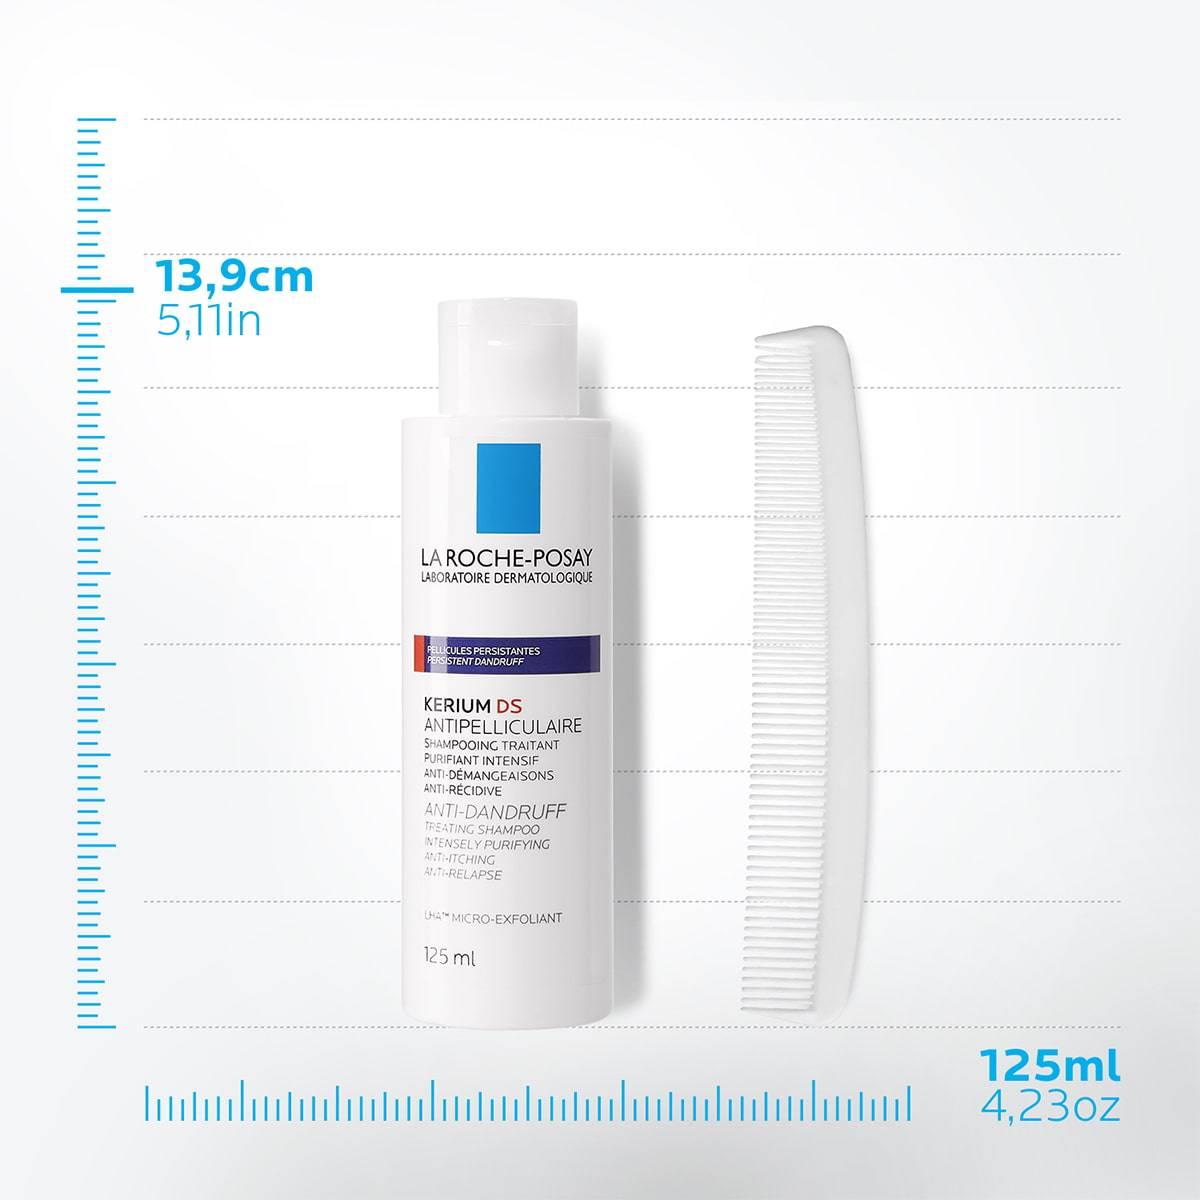 La Roche Posay ProduktSide Kerium DS Anti-skælplejesshampoo 12